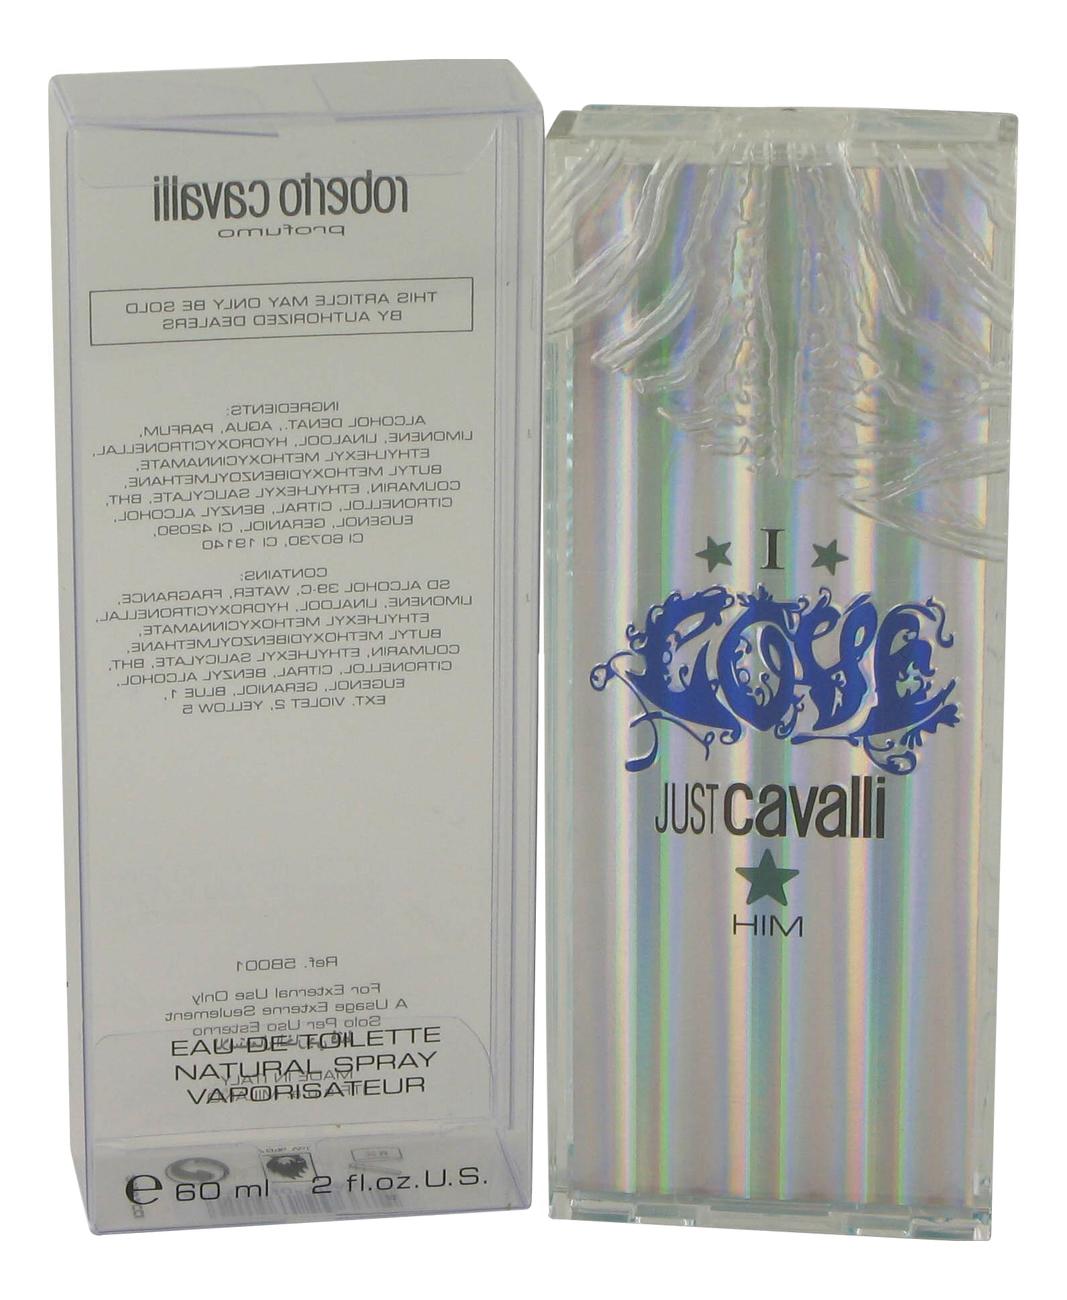 Roberto Cavalli Just I Love Him: туалетная вода 60мл